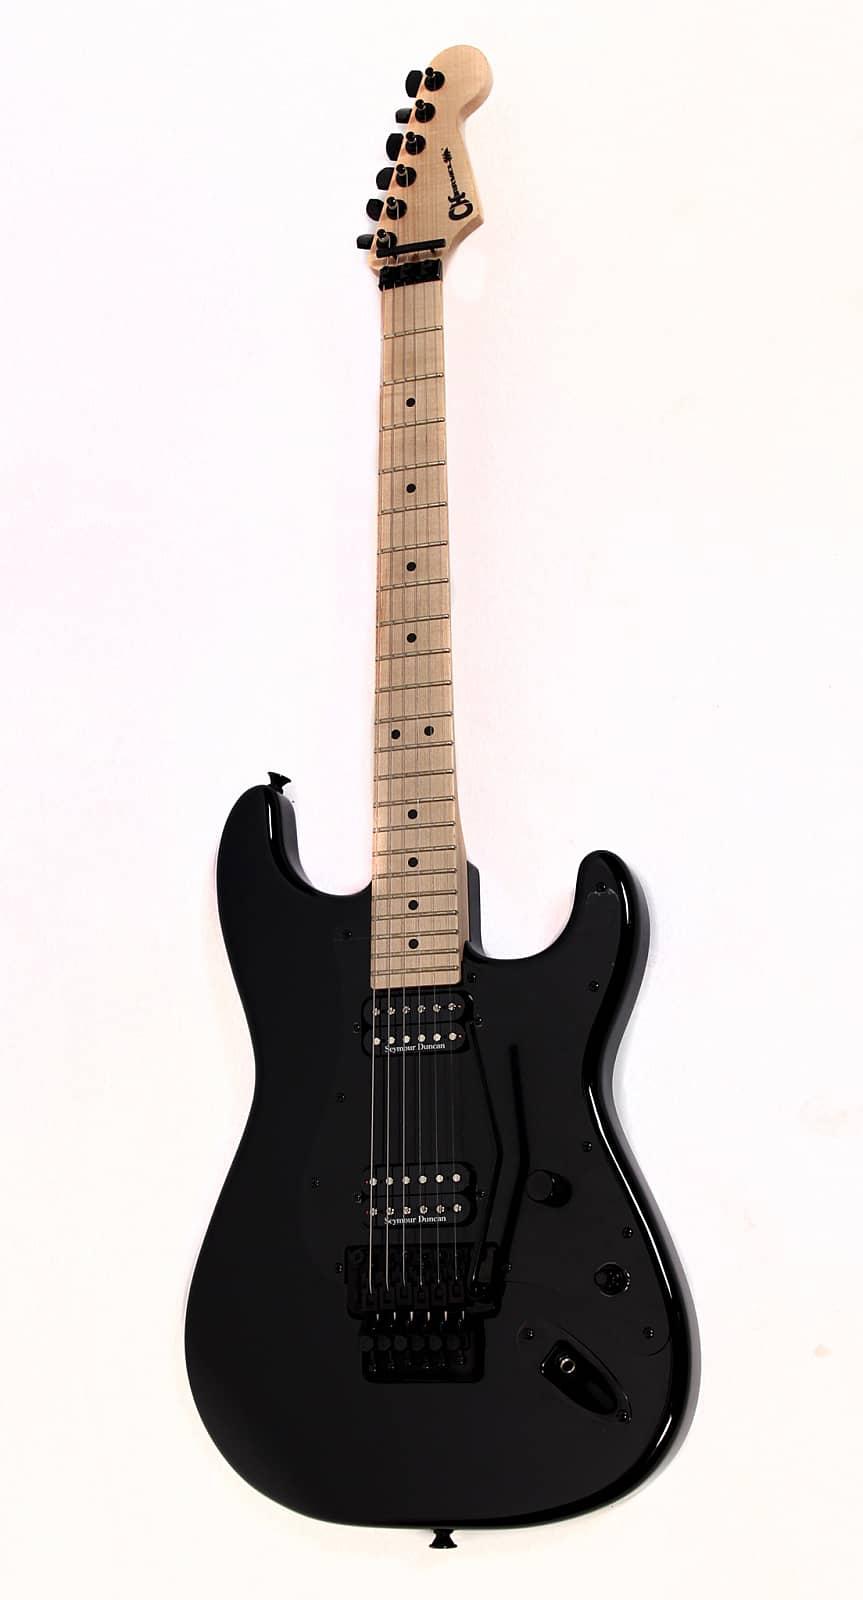 charvel so cal style 1 hh electric guitar black dimarzio reverb. Black Bedroom Furniture Sets. Home Design Ideas